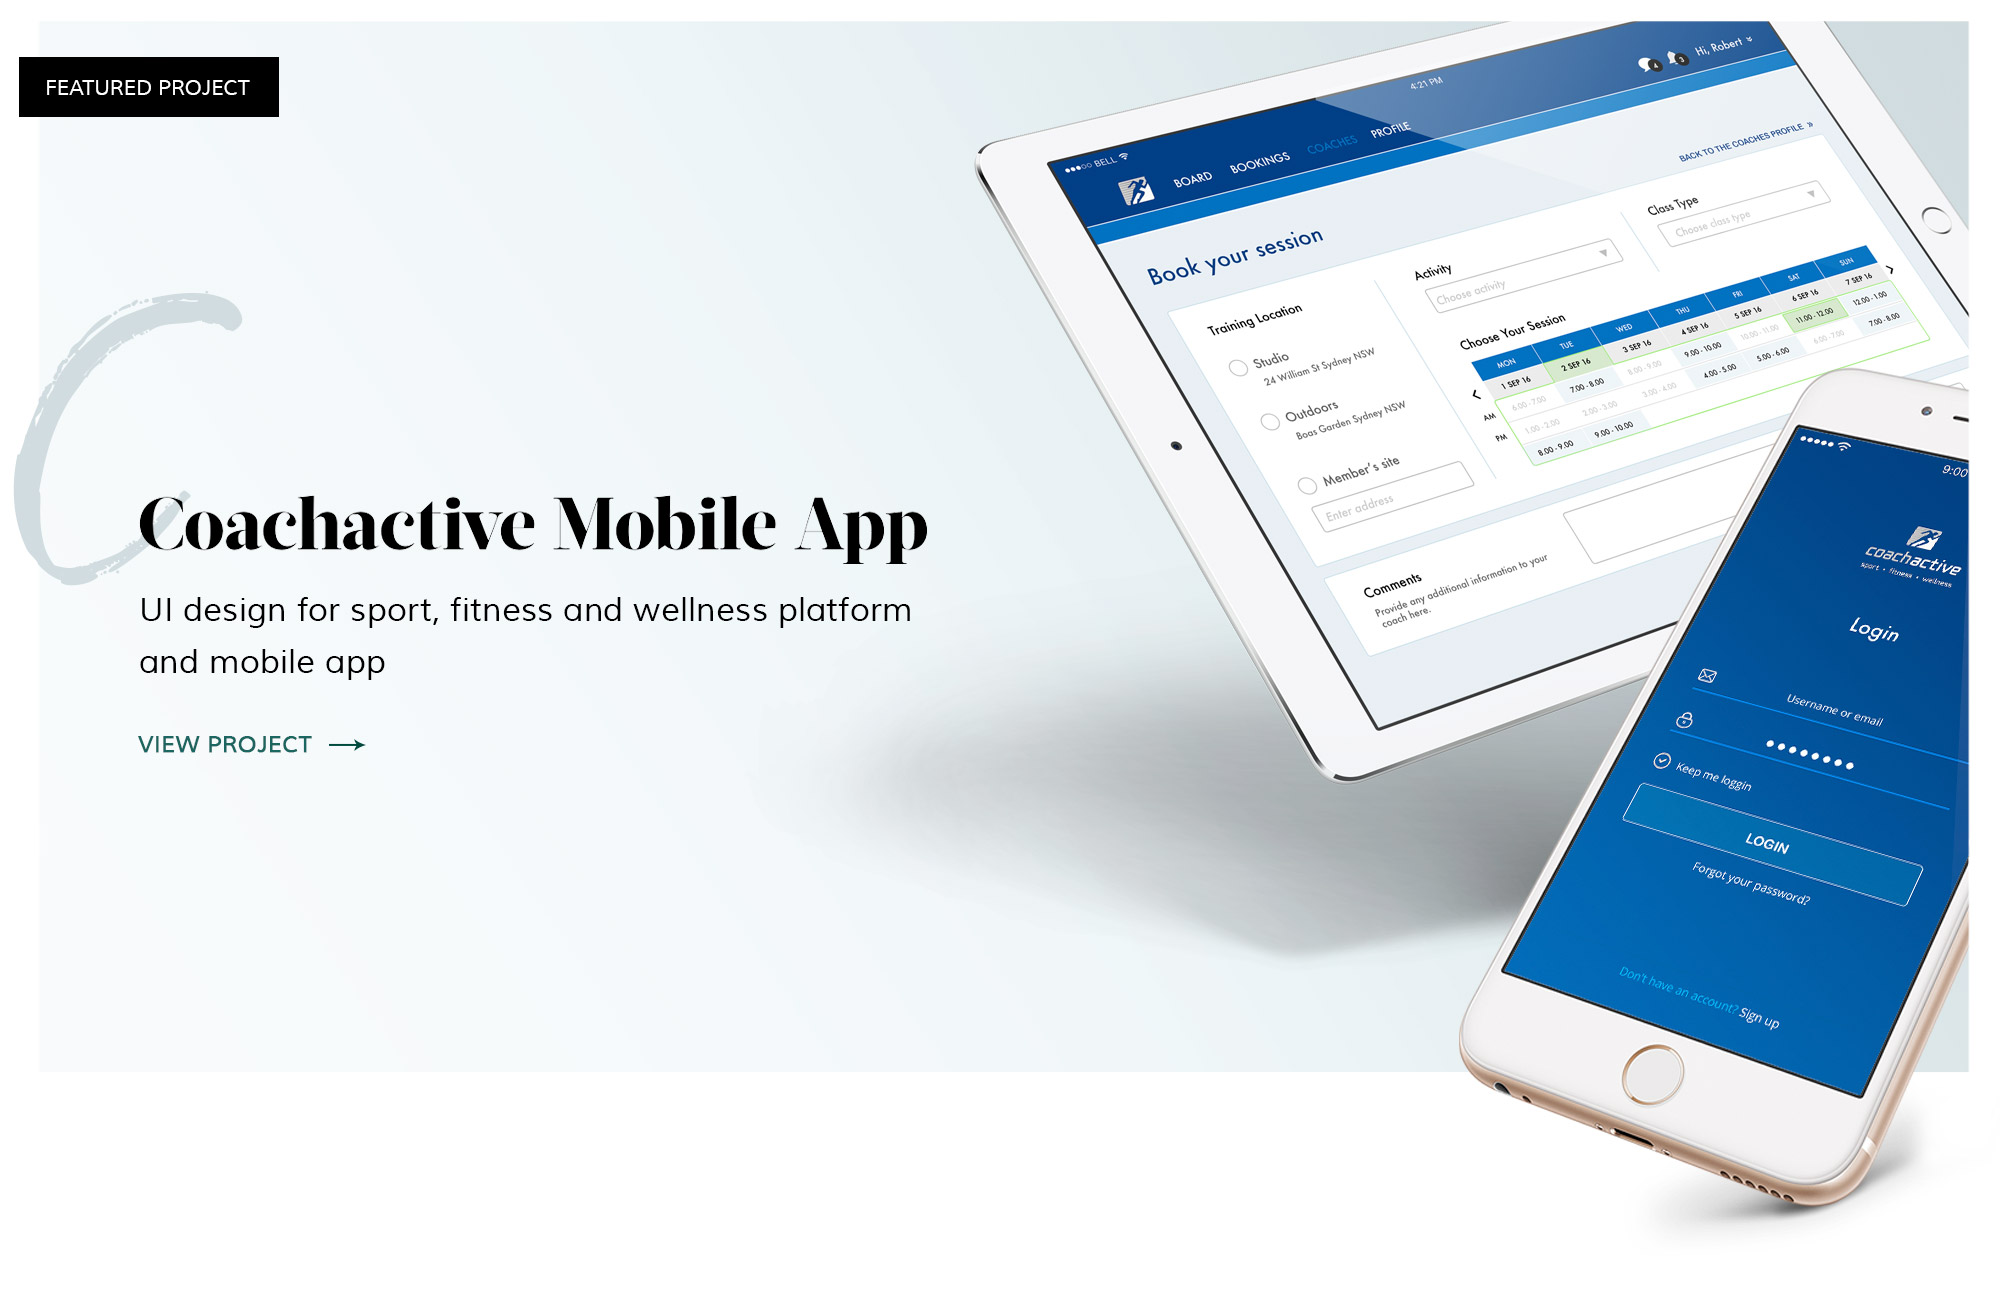 Coachactive Mobile App